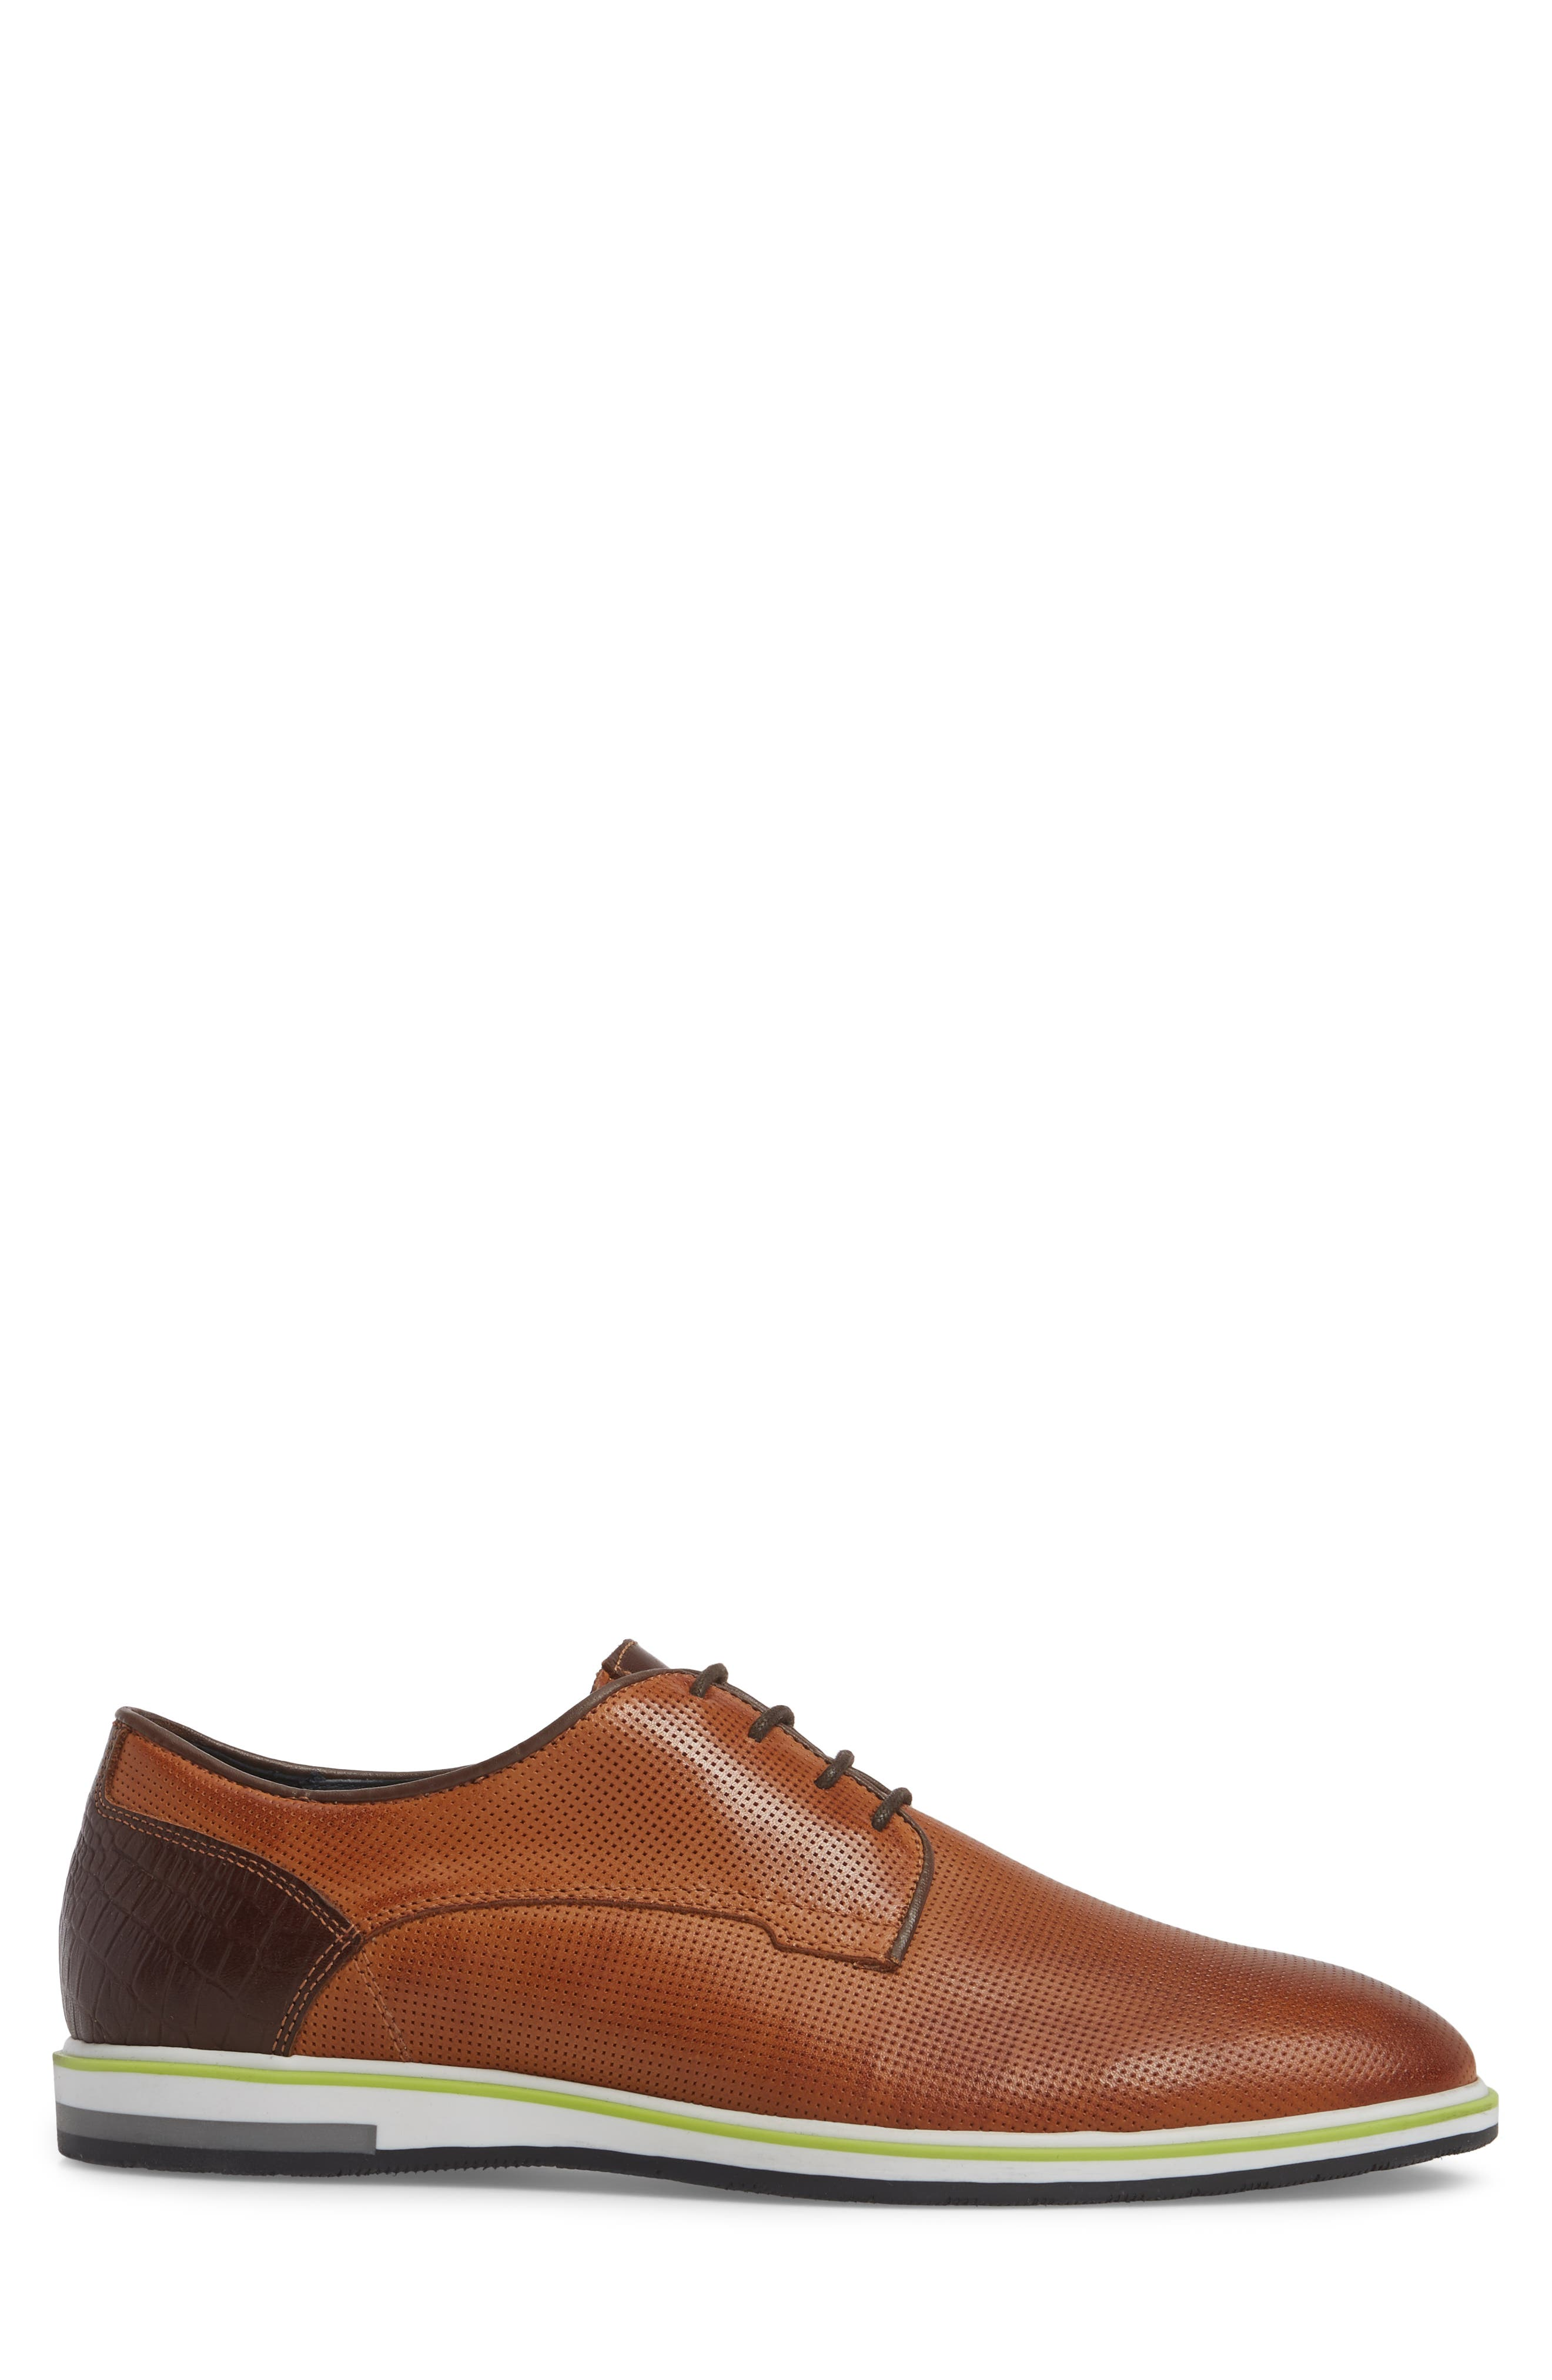 Plus Casual Perforated Derby,                             Alternate thumbnail 3, color,                             Cognac/ Dark Cognac Leather